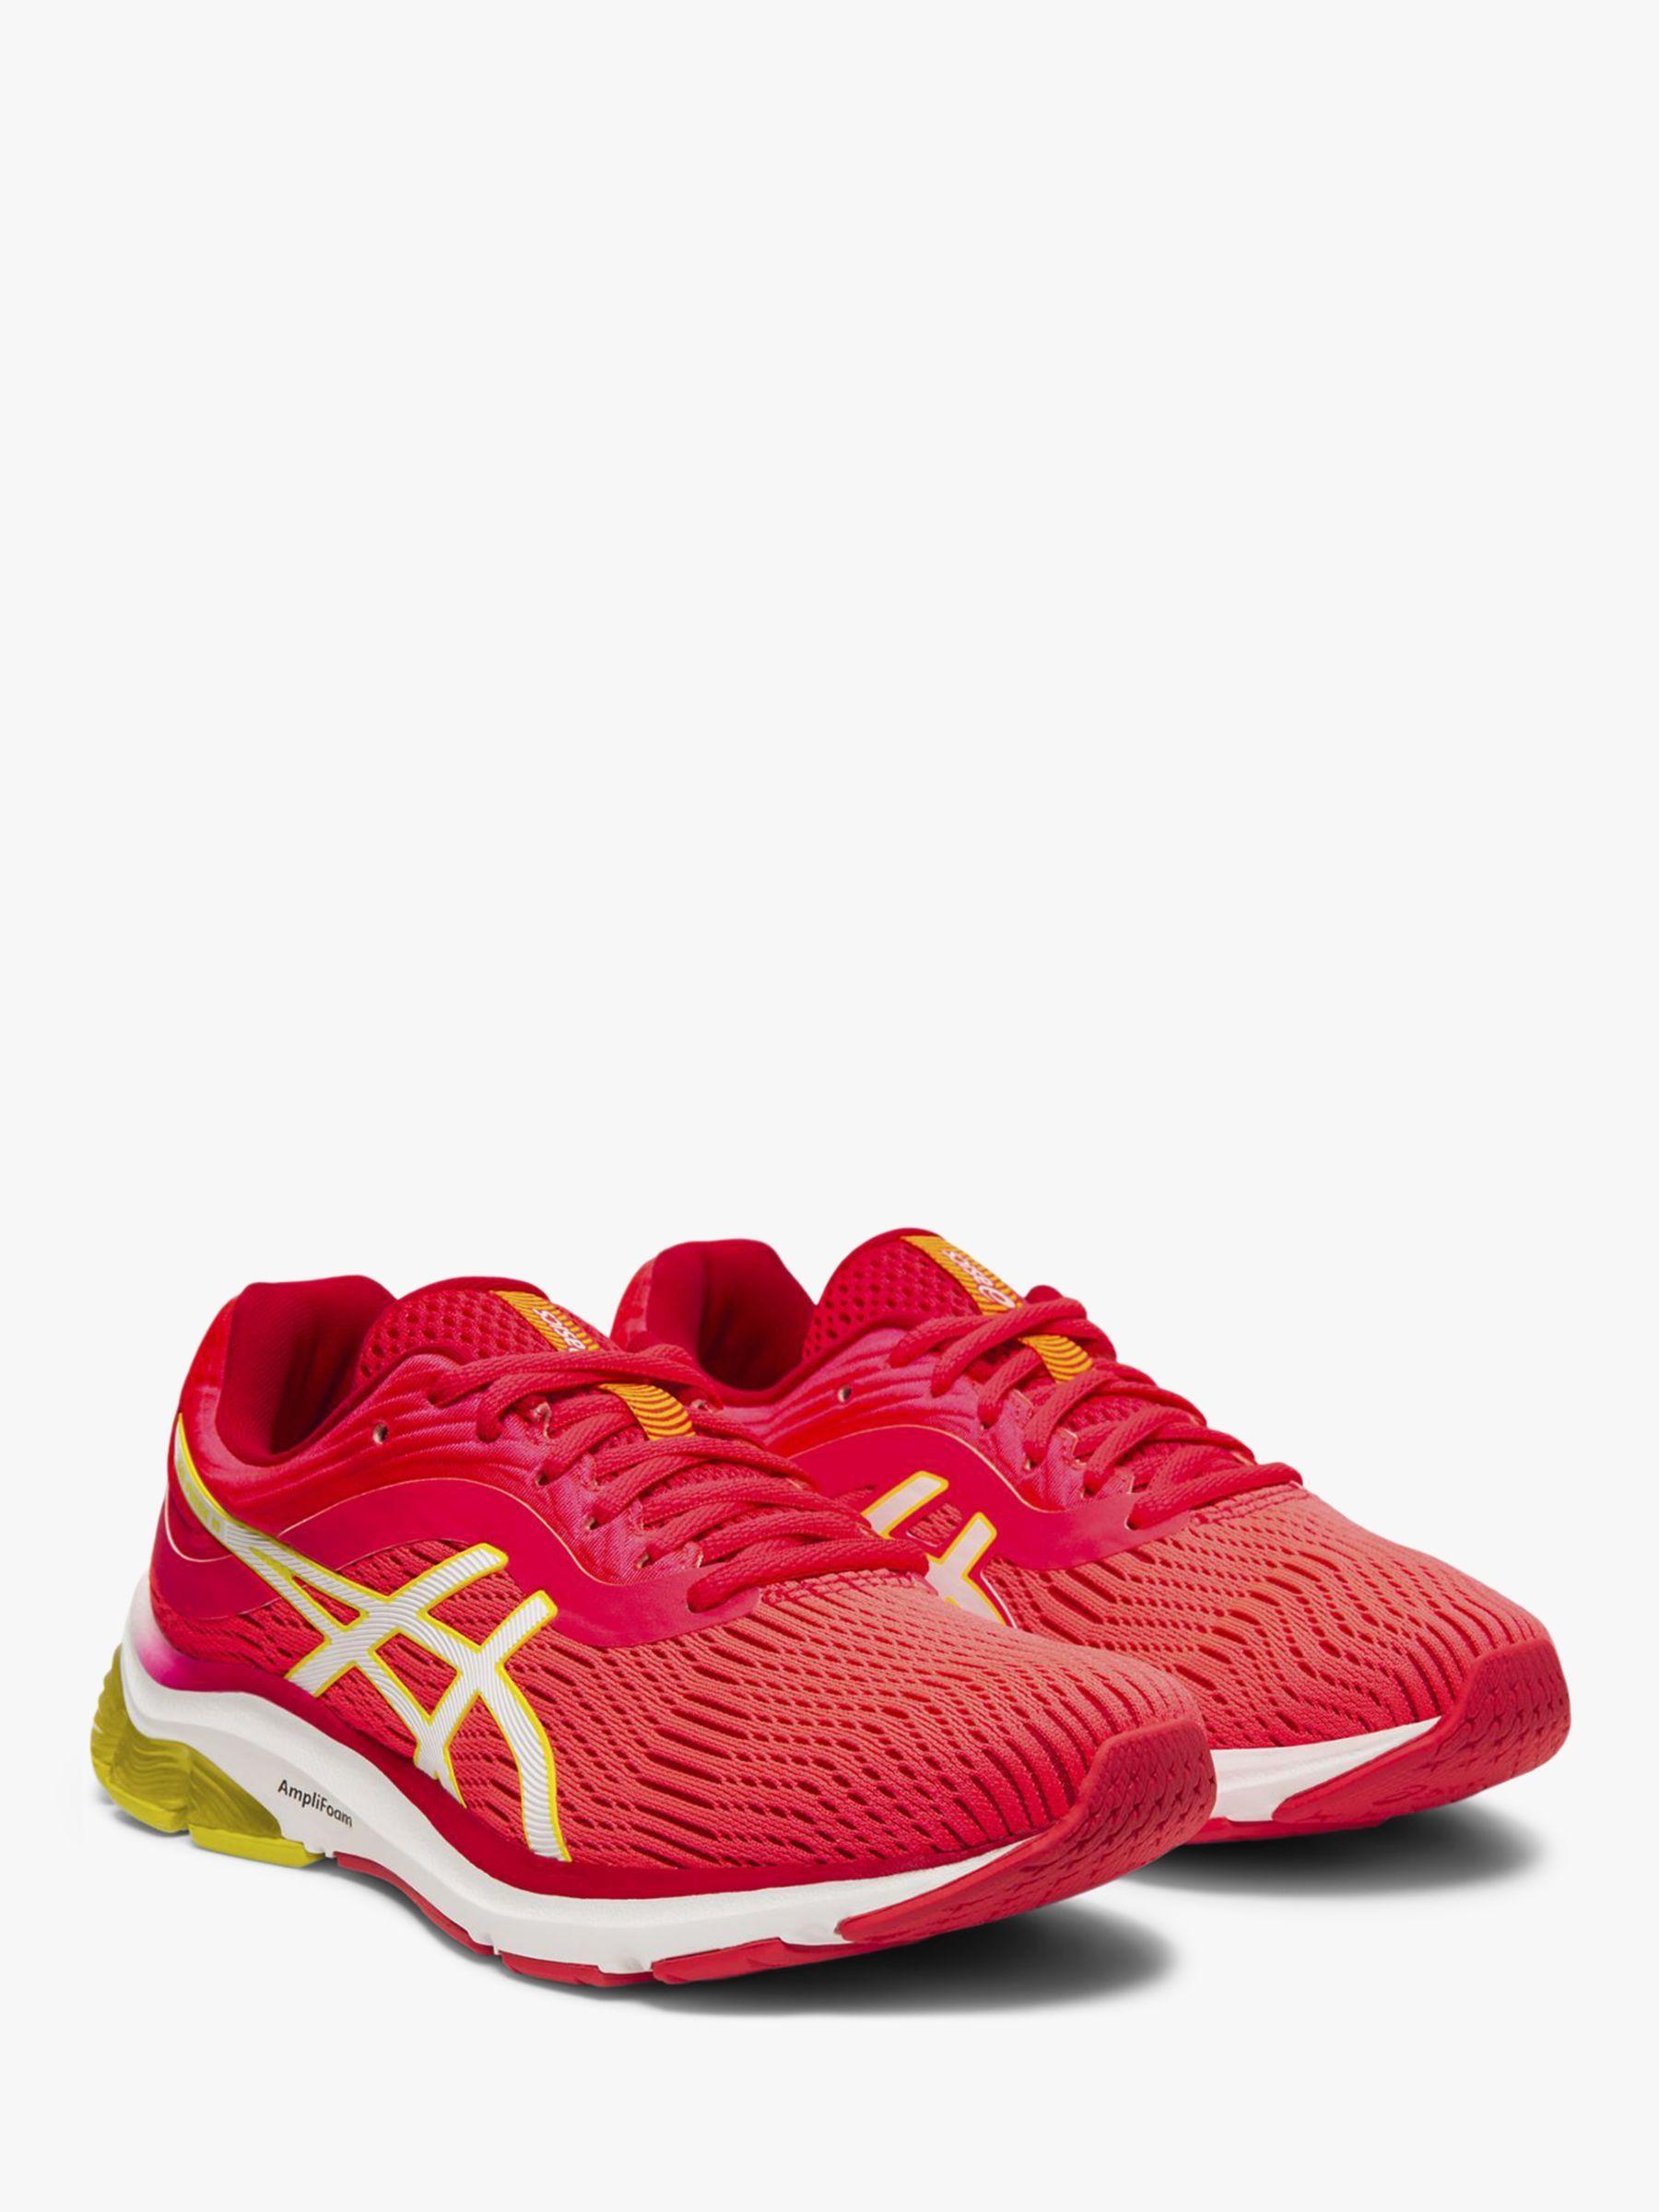 ASICS GEL-PULSE 11 Women's Running Shoes, Lazer Pink/Sour ...